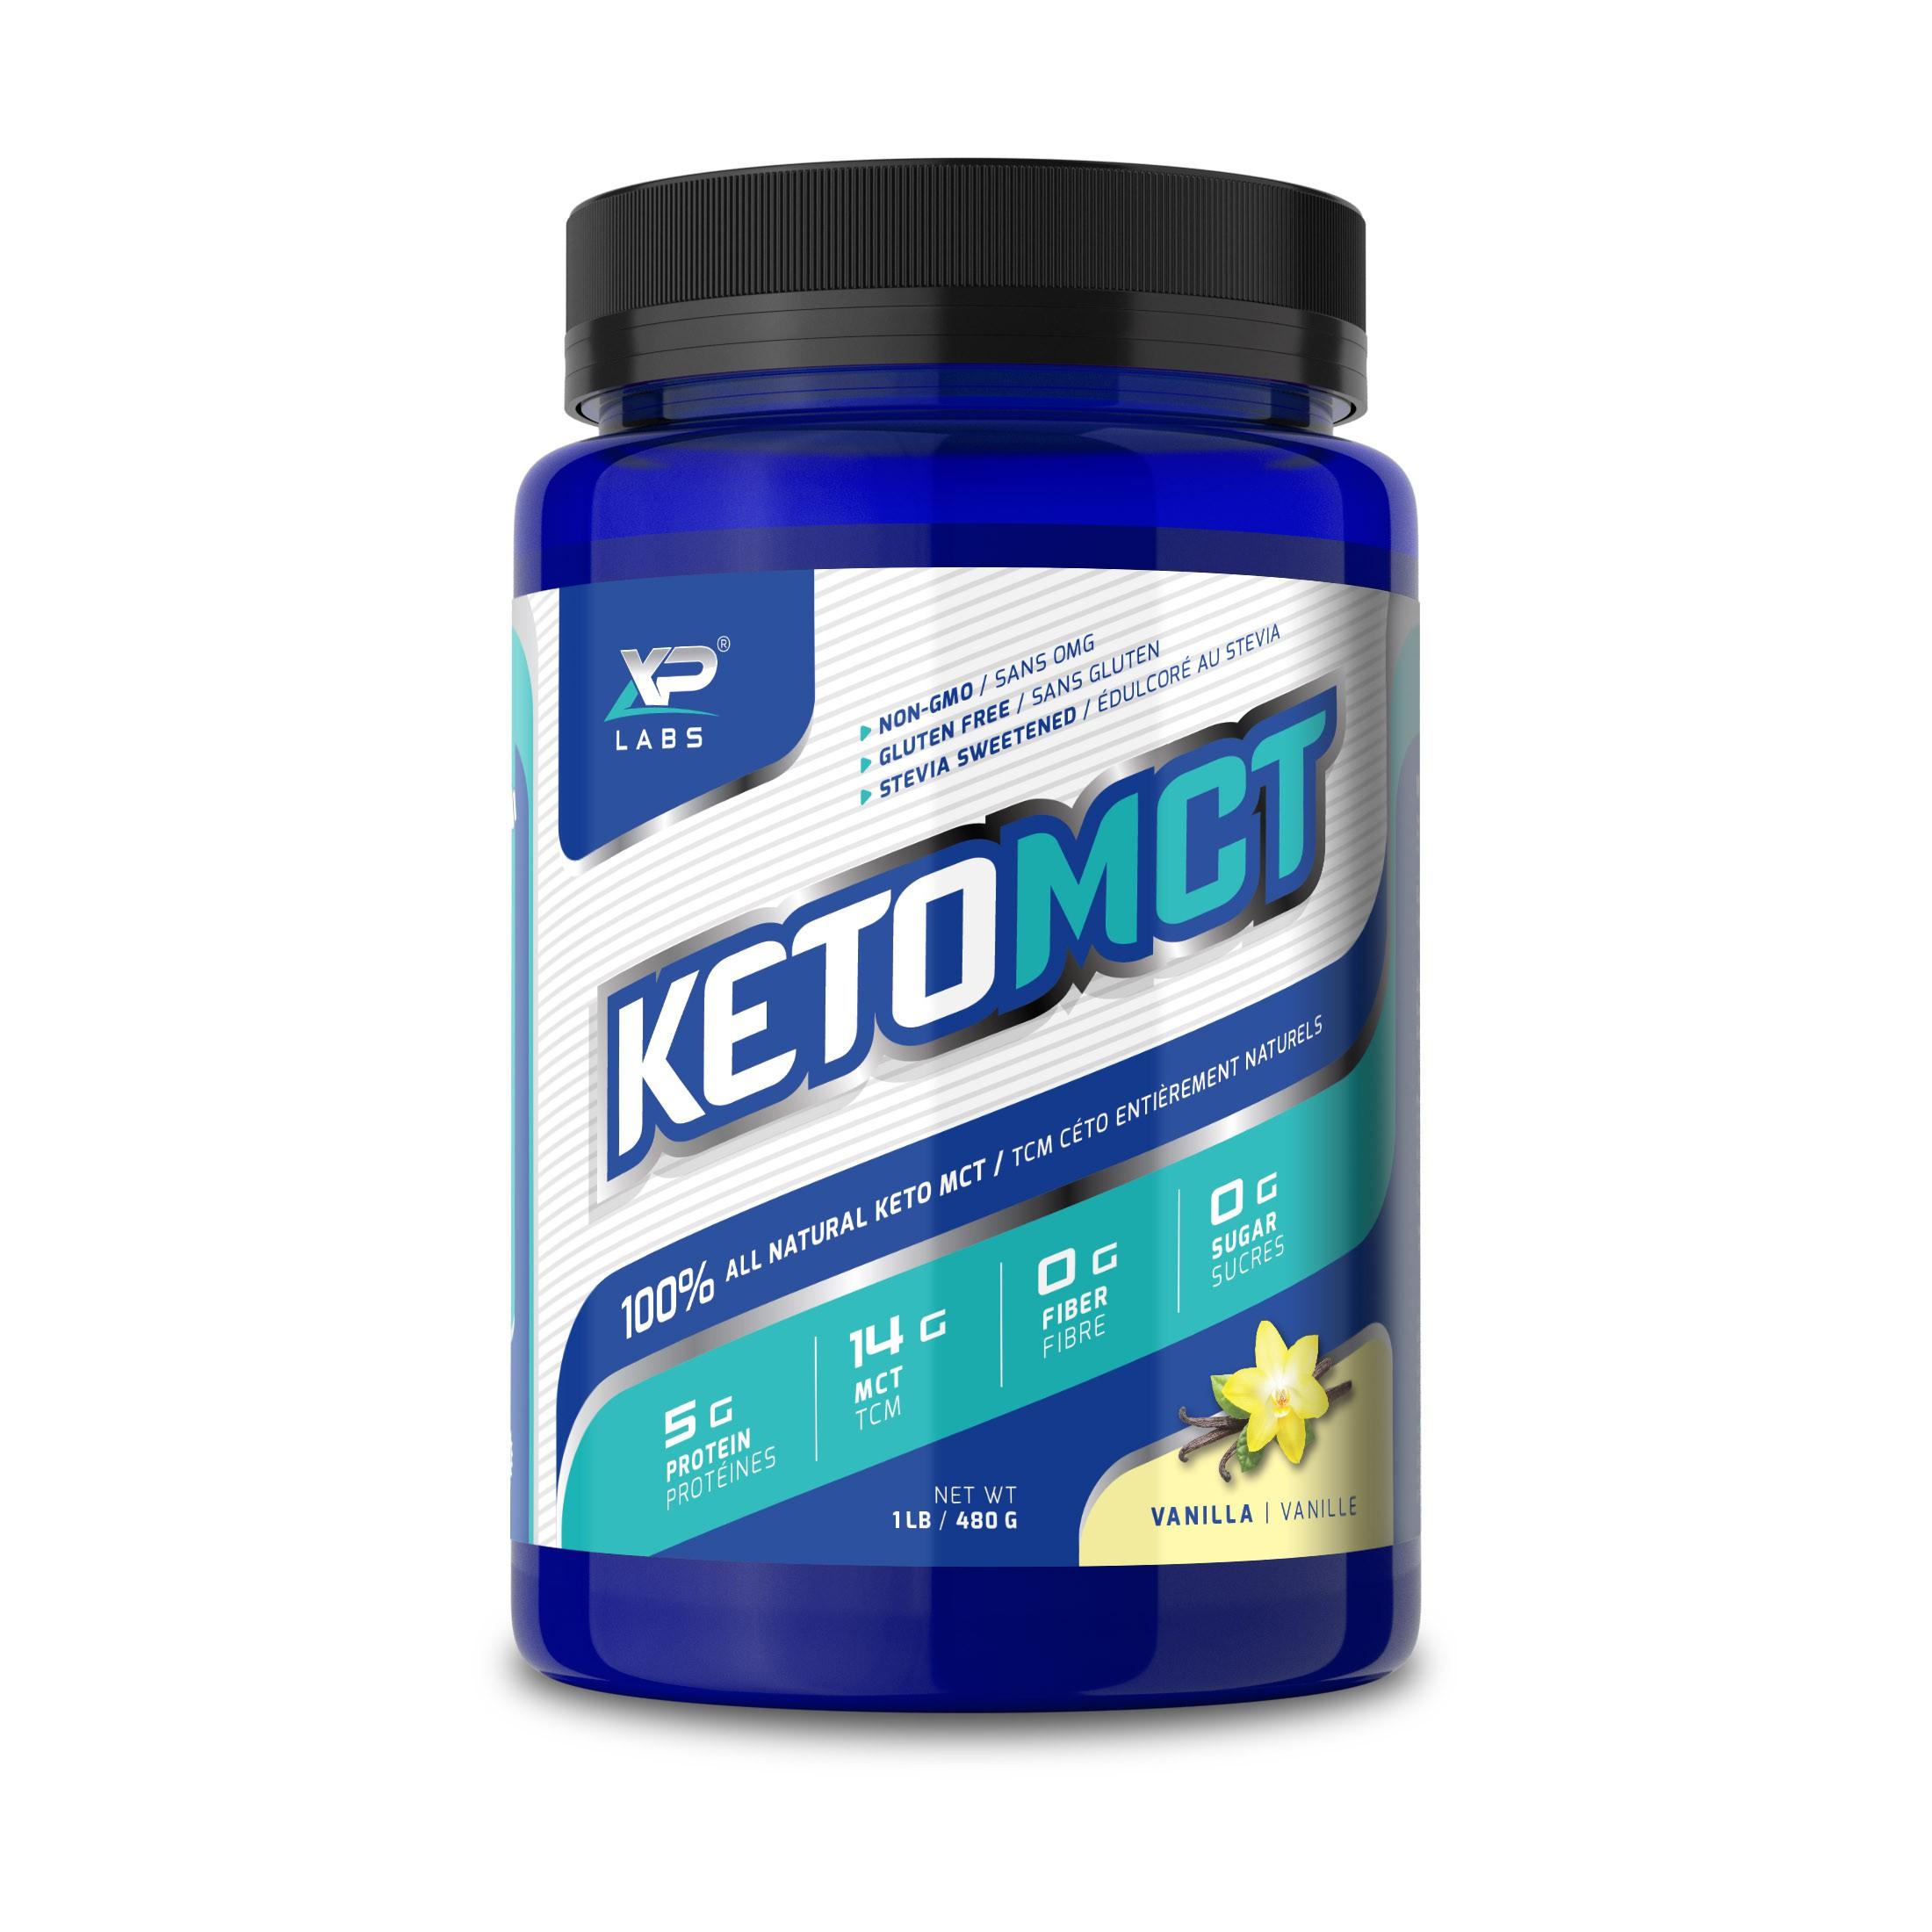 KetoMCT - Label Design